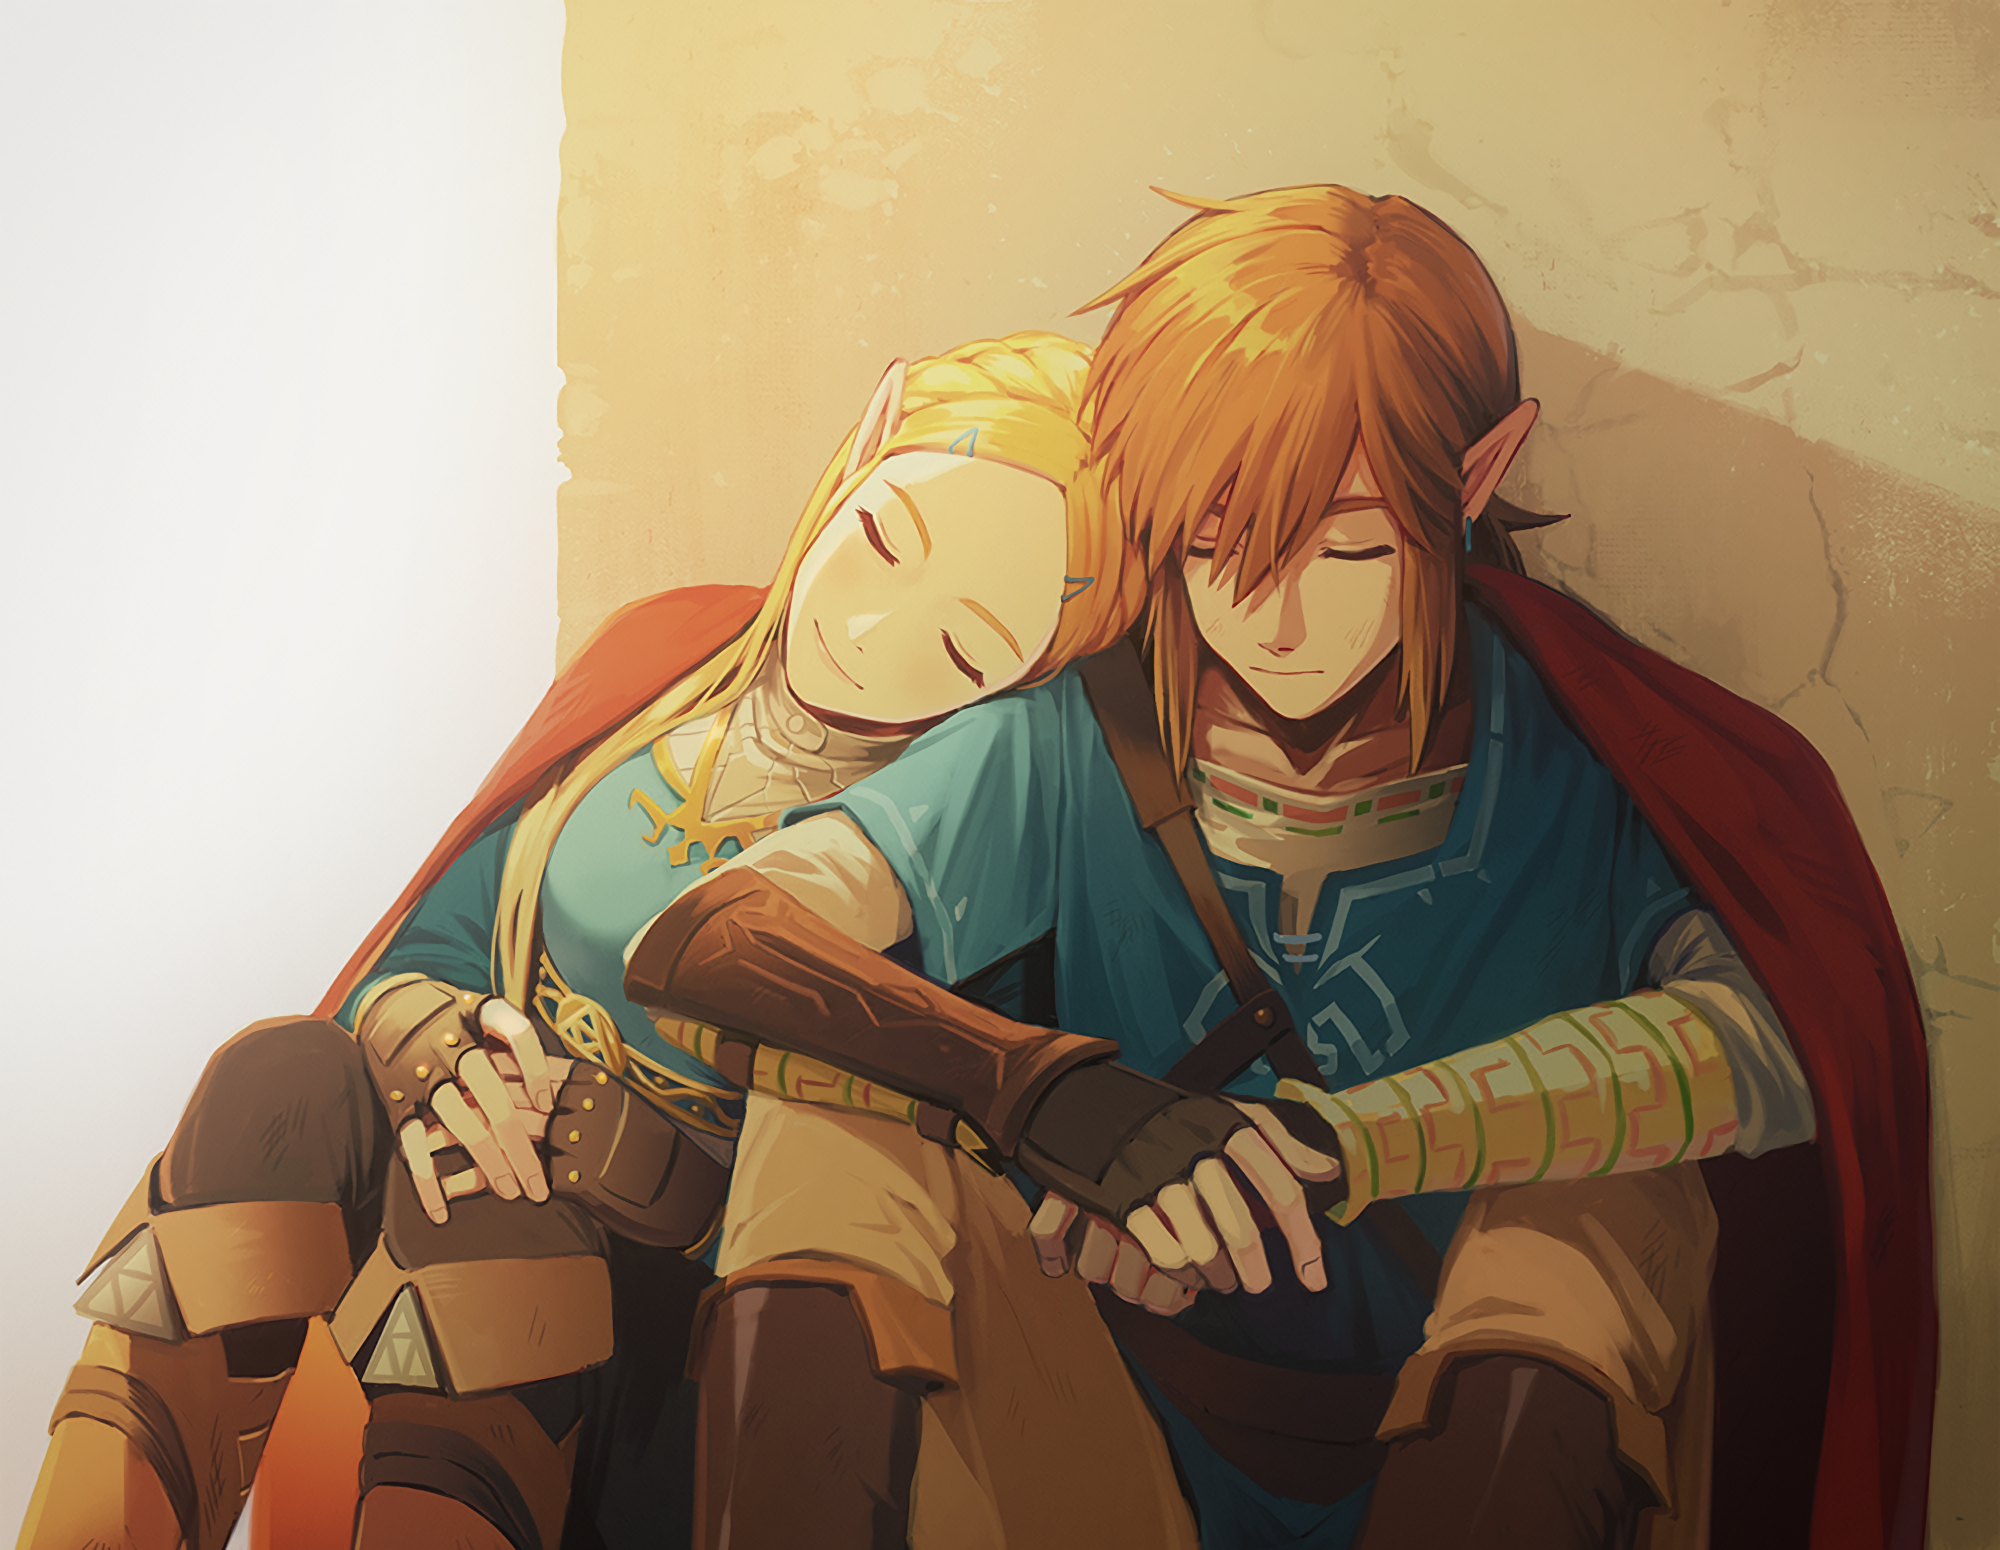 168 The Legend Of Zelda Breath Of The Wild Hd Wallpapers